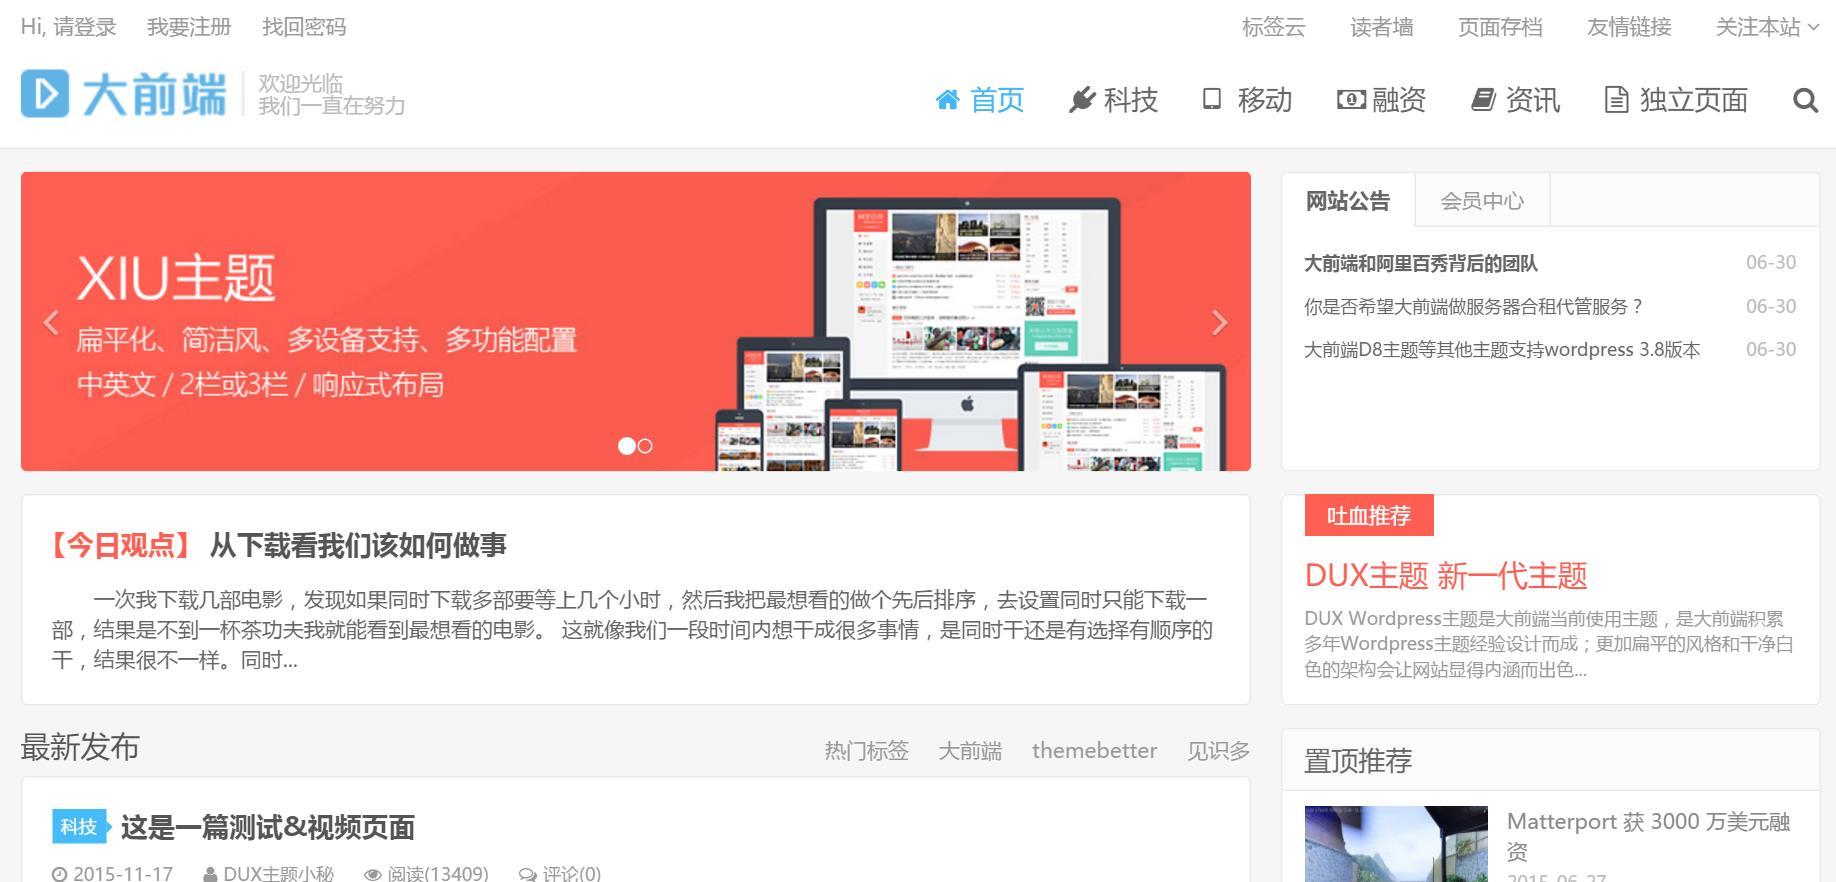 DUX-for-Typecho.jpg